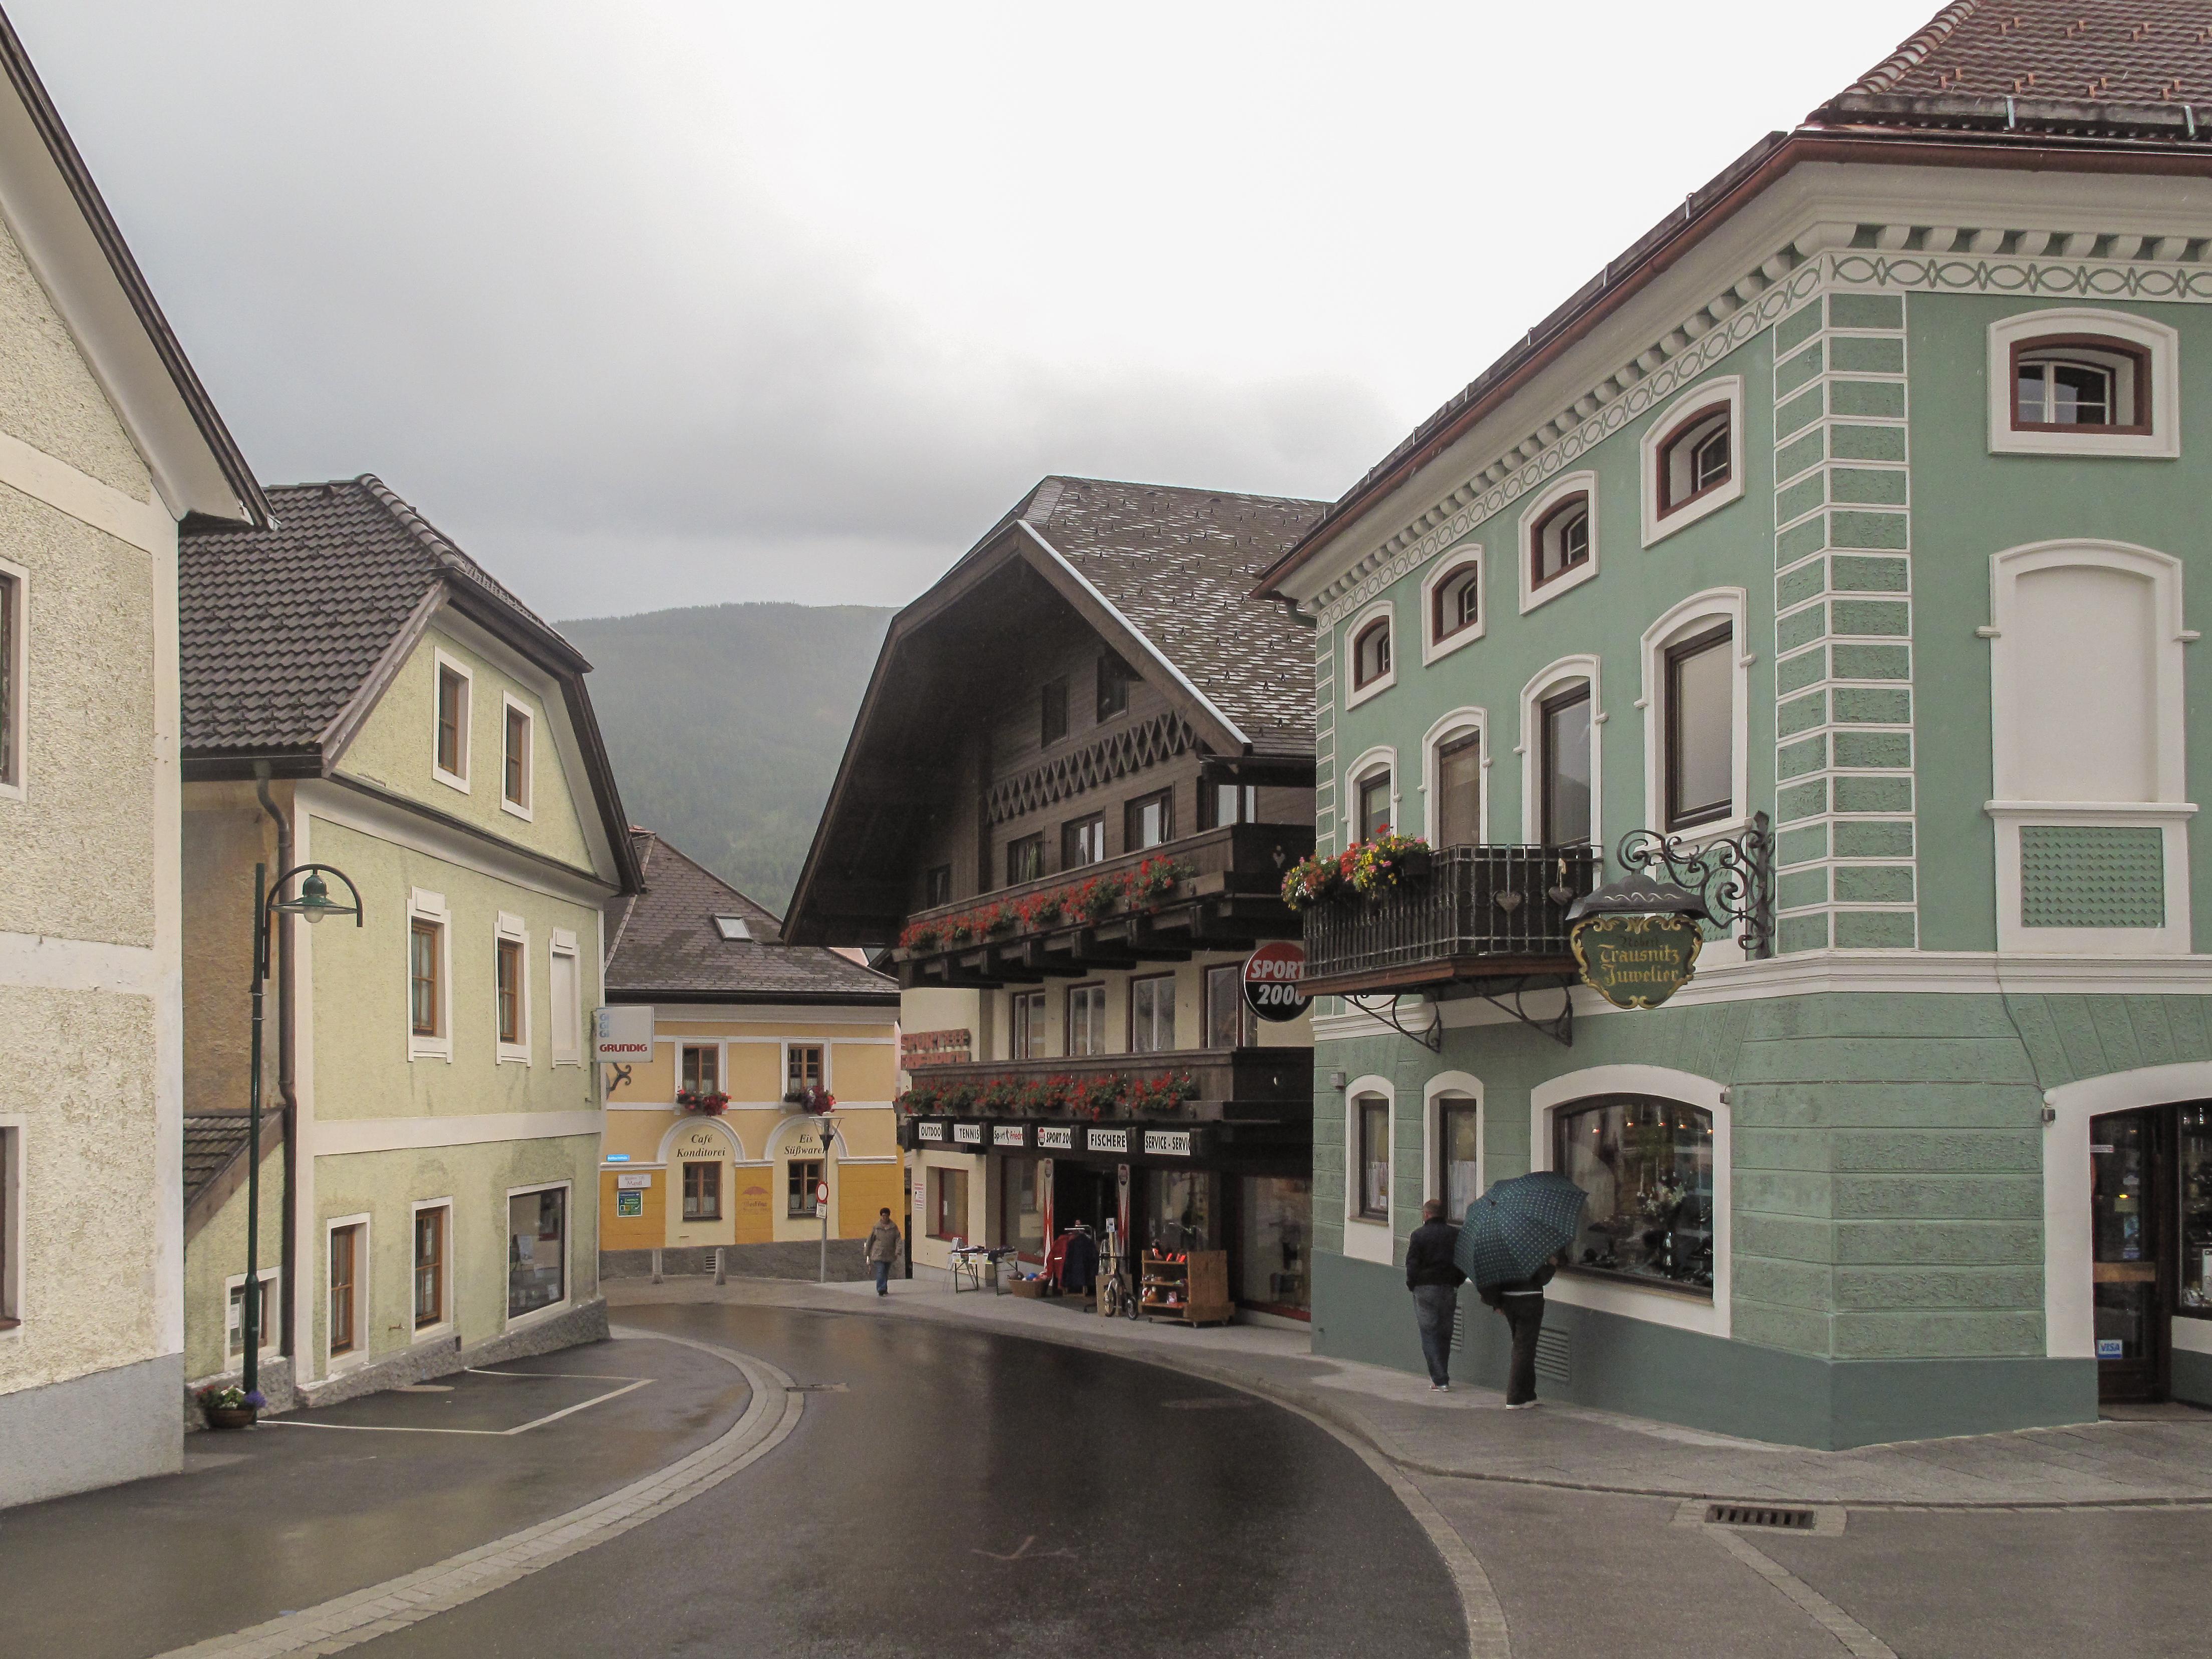 Salzburg to Sankt Michael im Lungau - 3 ways to travel via